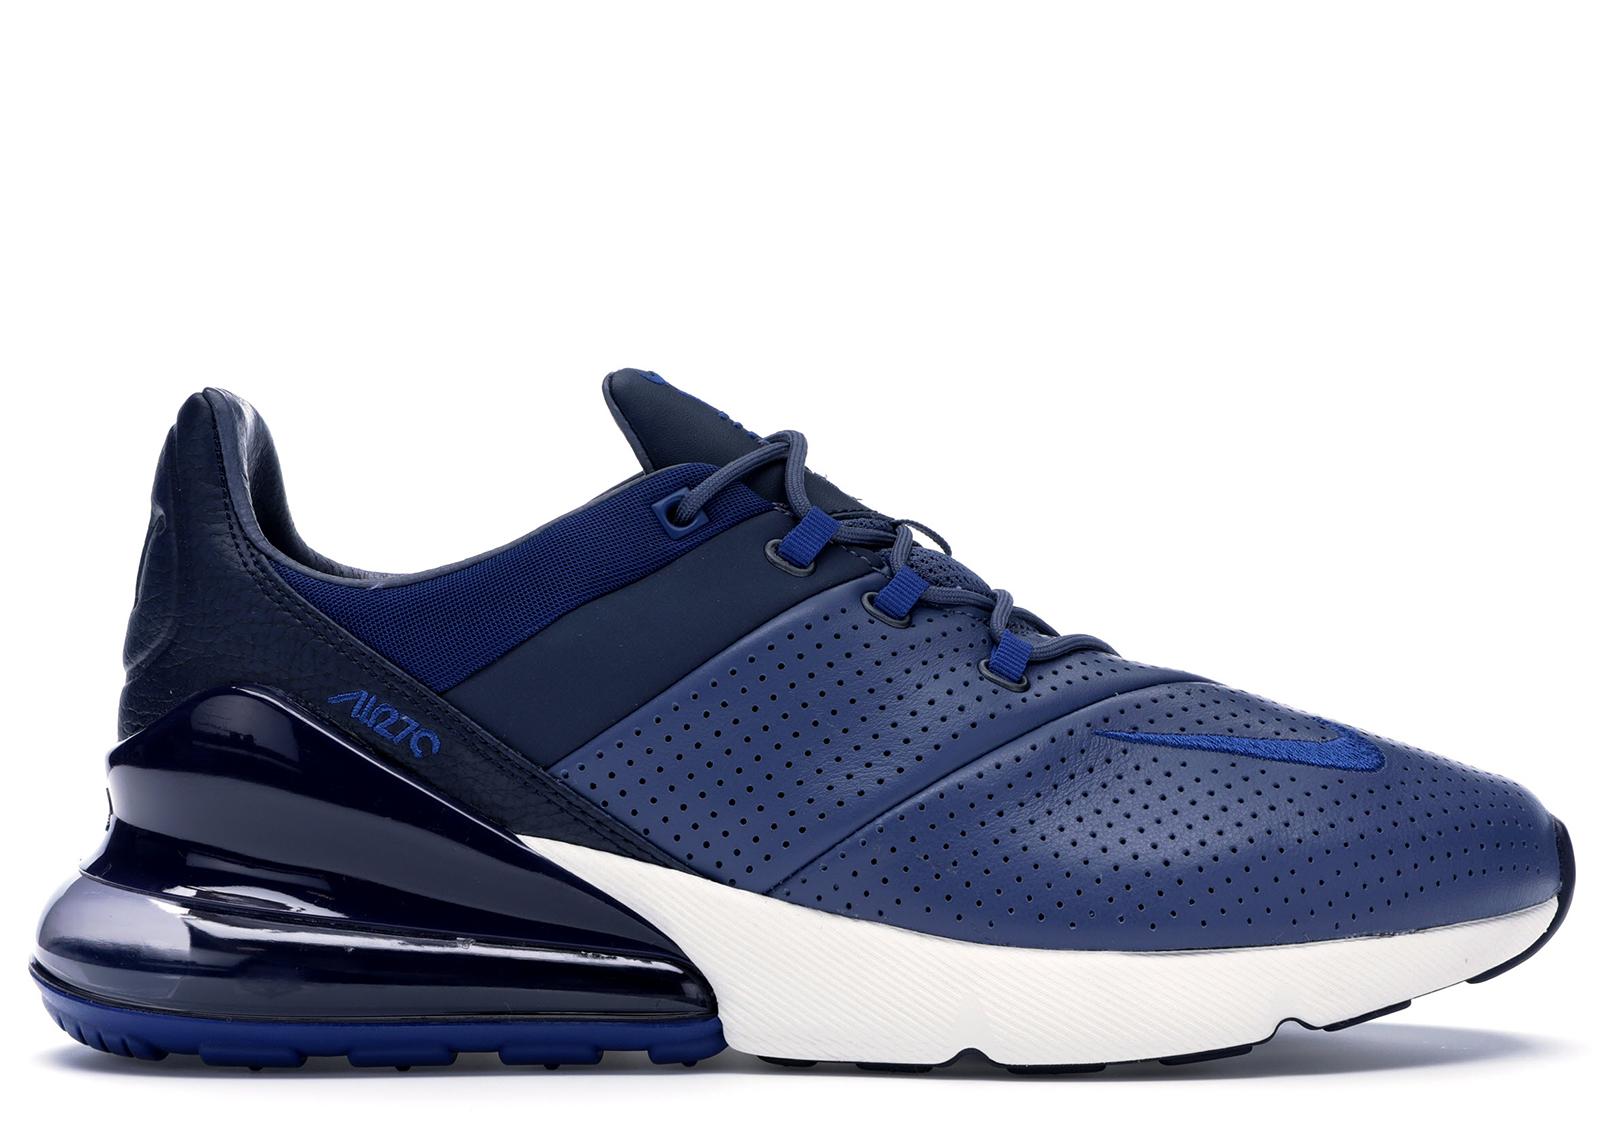 Nike Air Max 270 Premium Diffused Blue